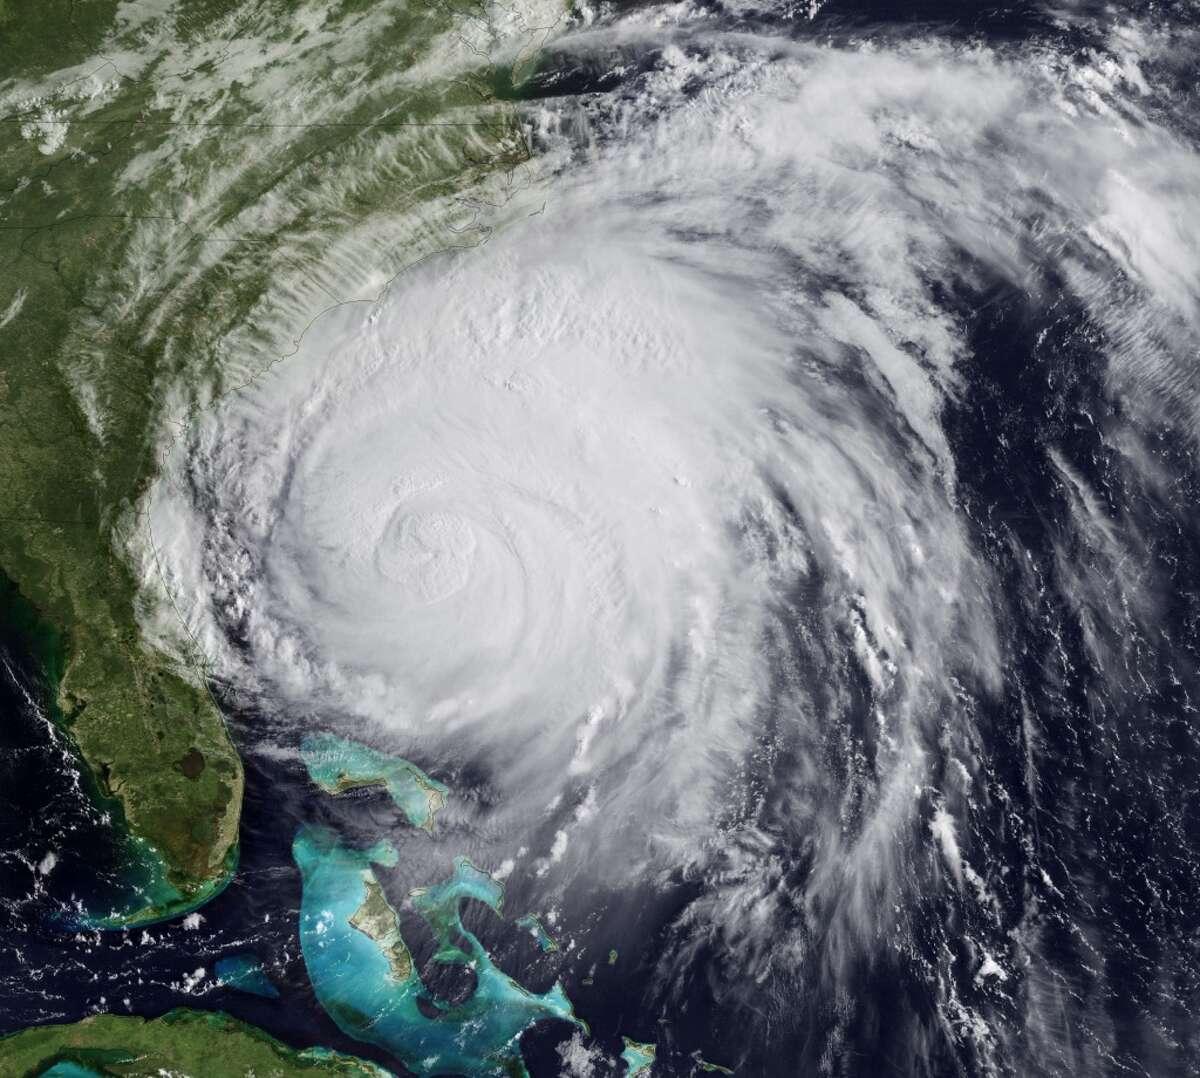 Hurricane Irene hit in 2011.